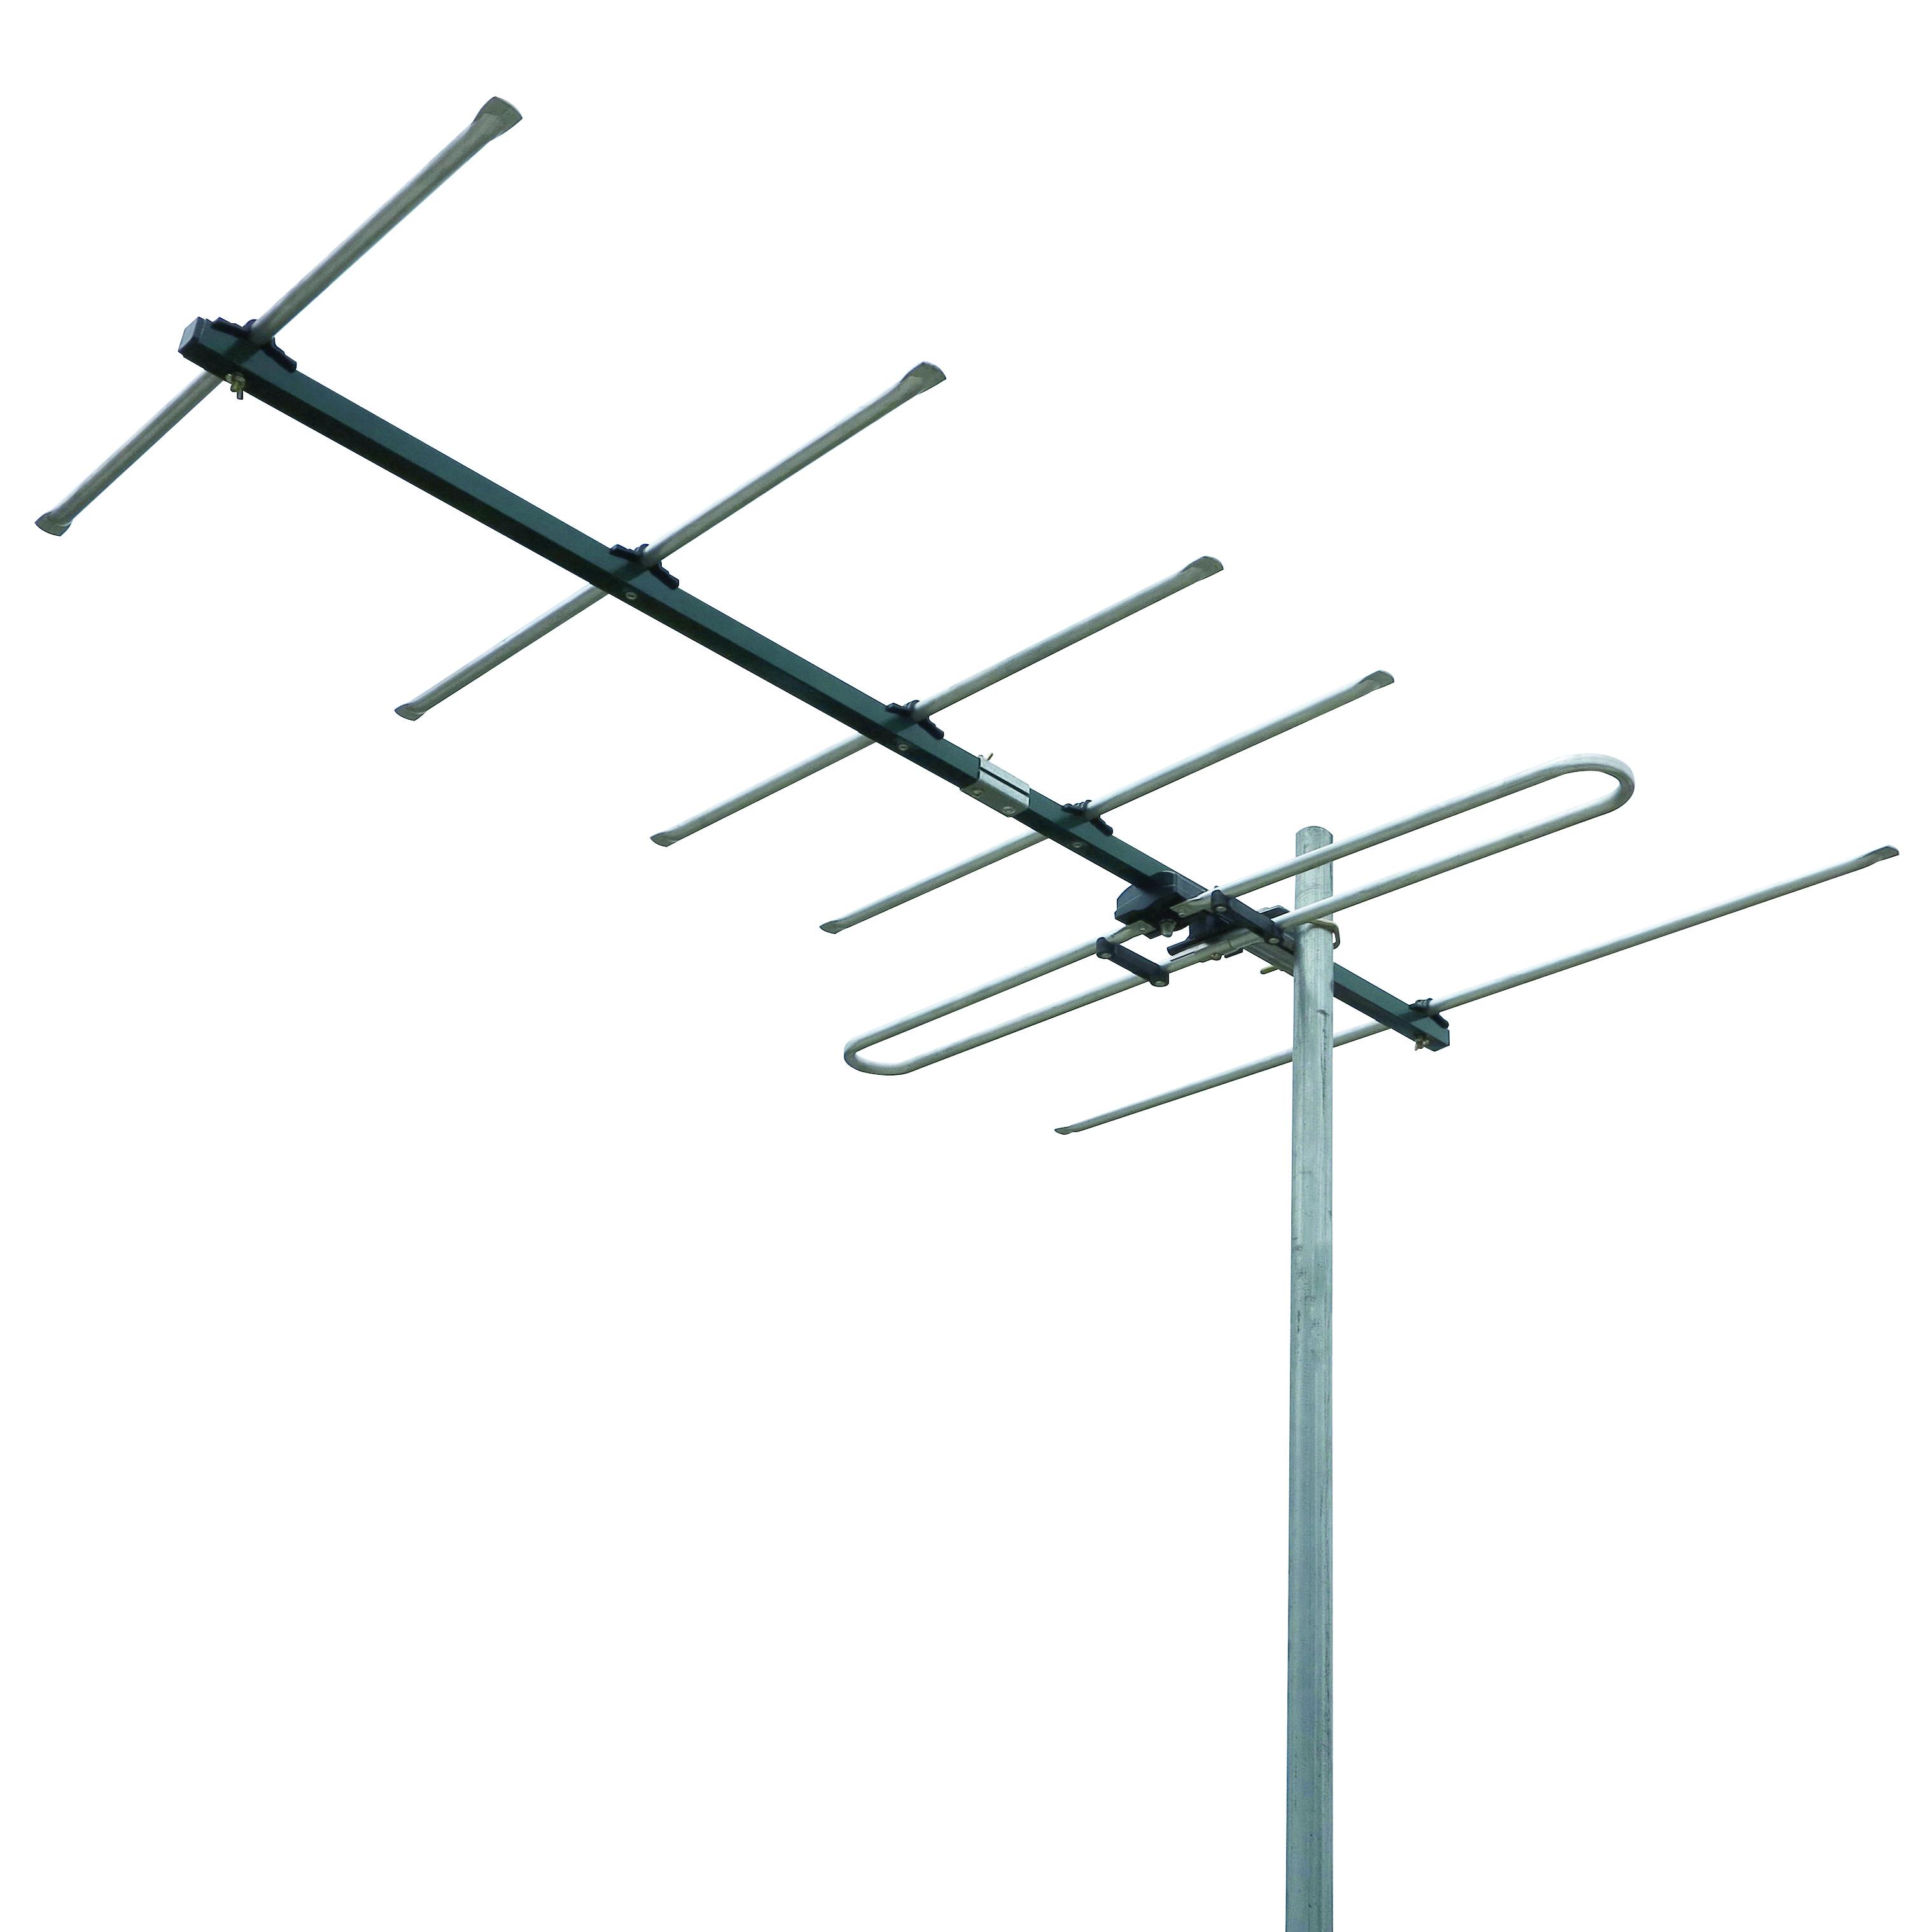 03MM-DR3006 - Digital TV Antenna VHF (6-12) 6 Elements - Matchmaster ...